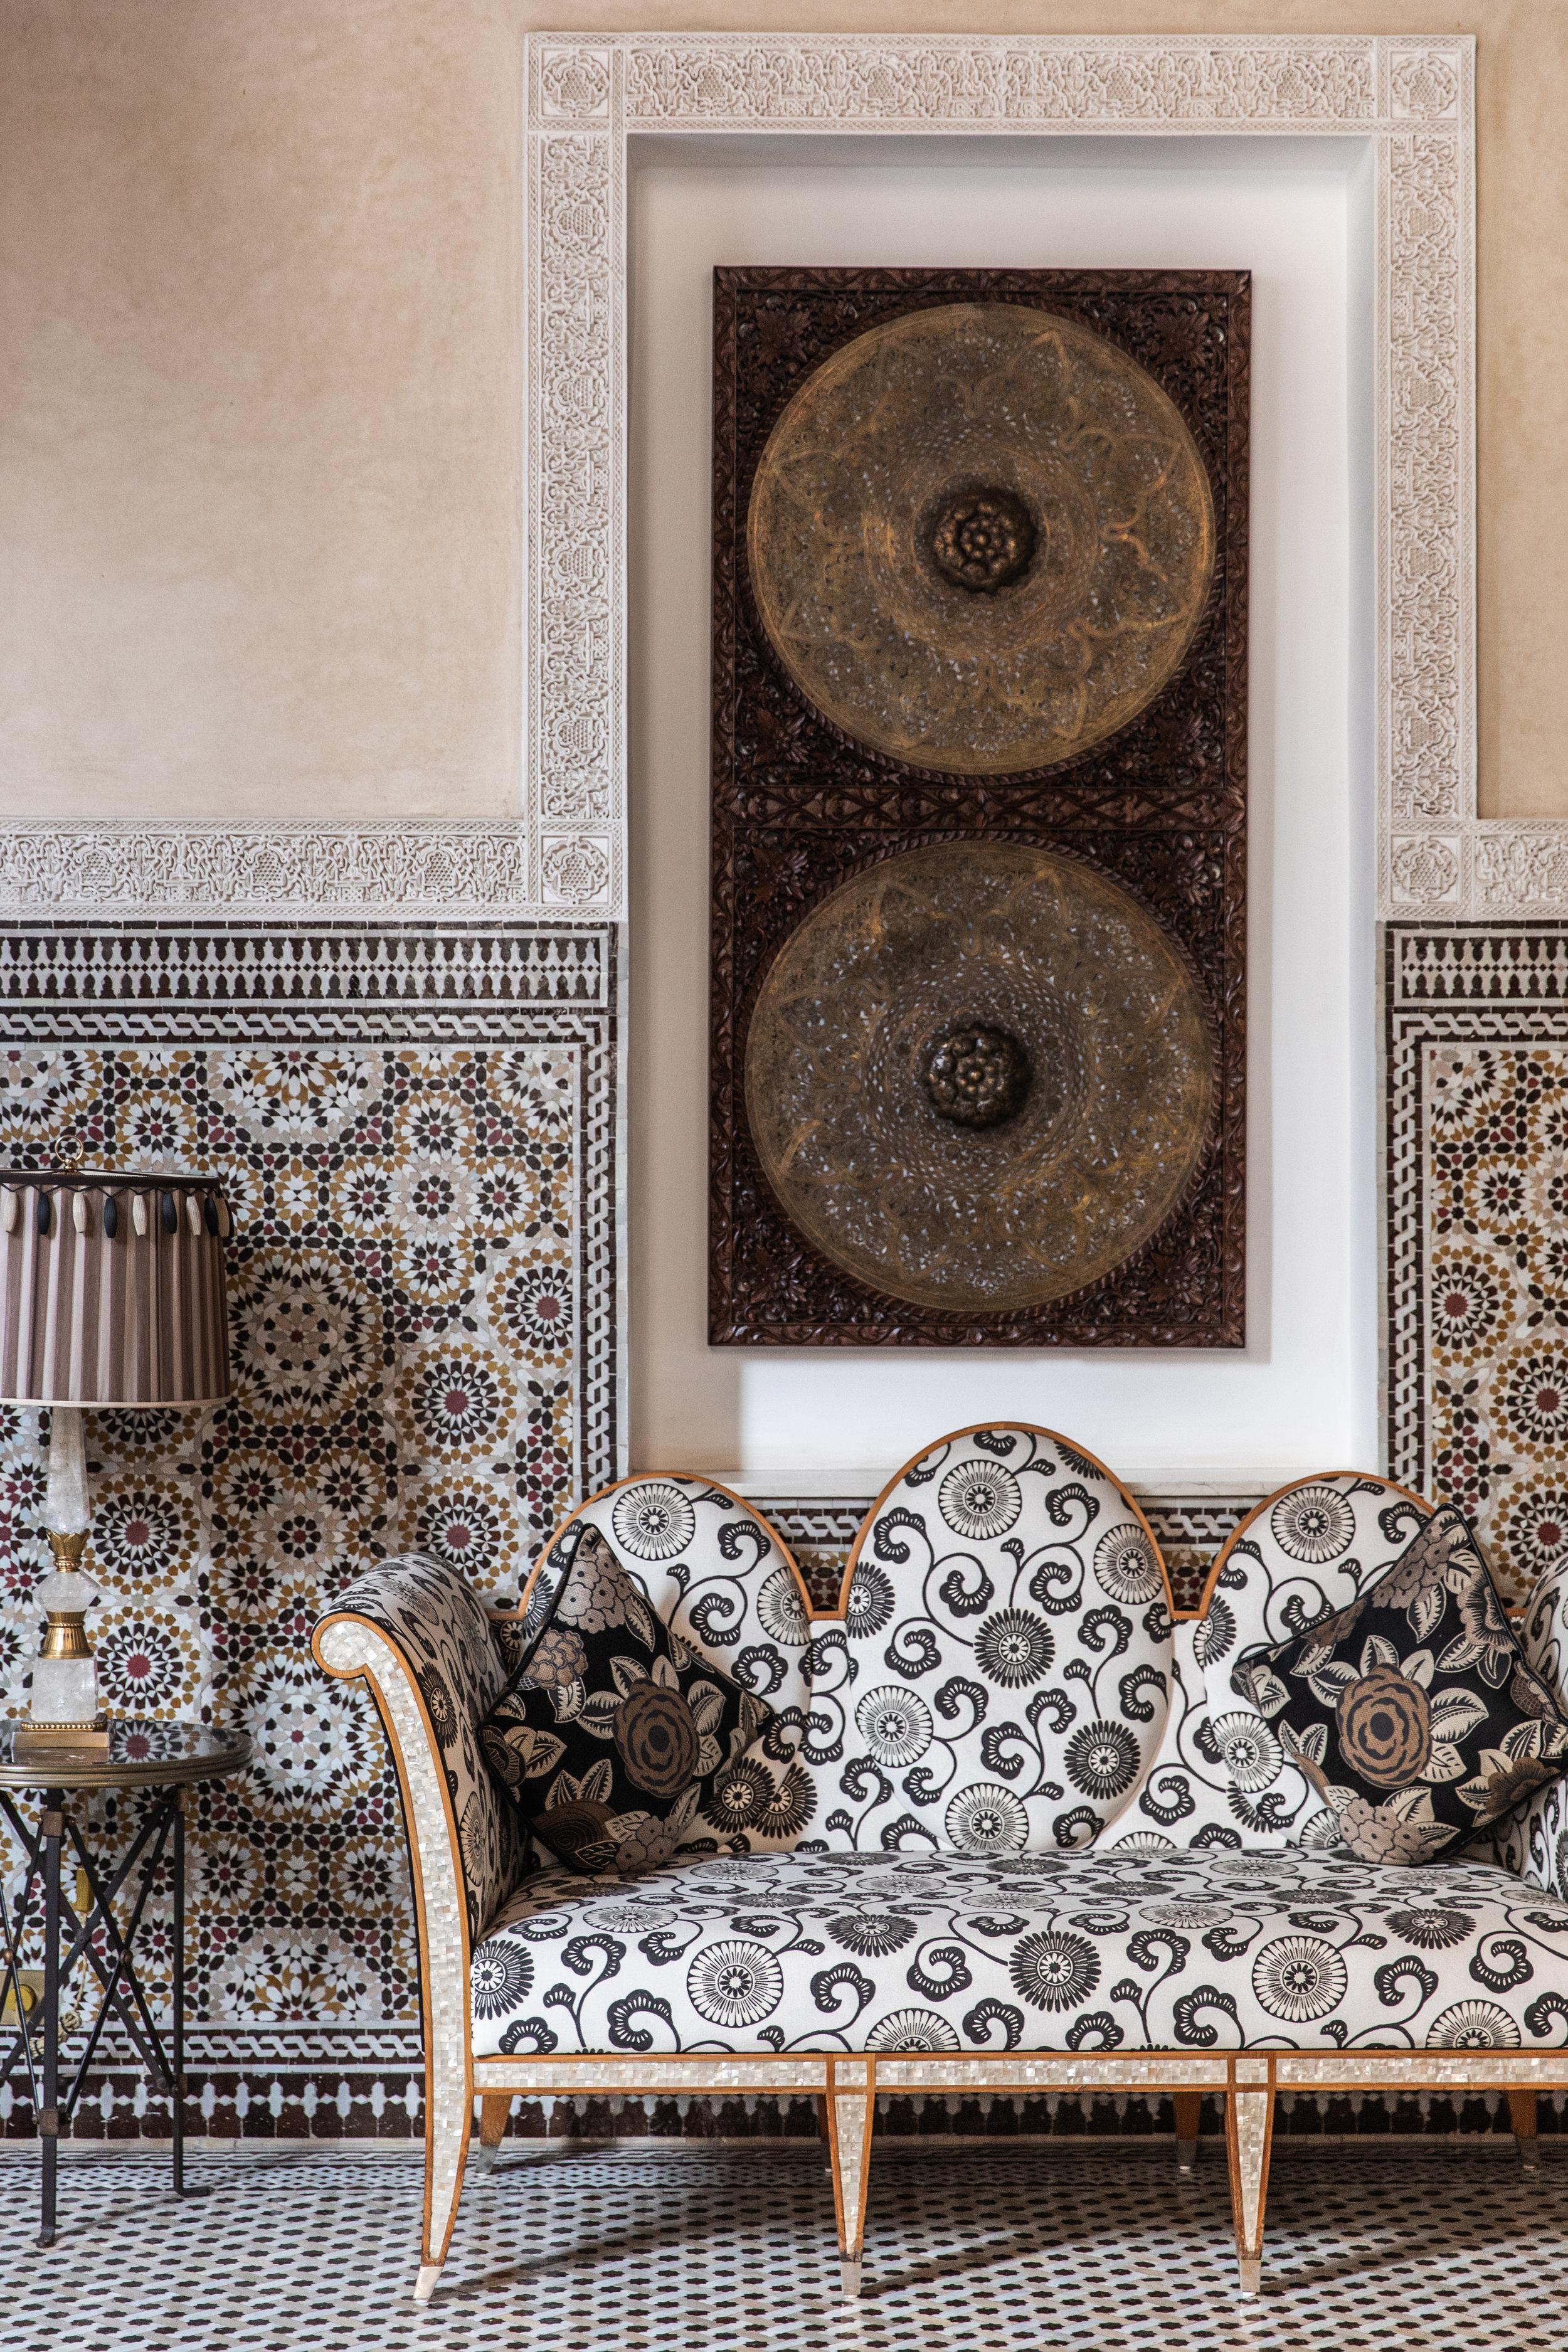 Morocco-3096.jpg